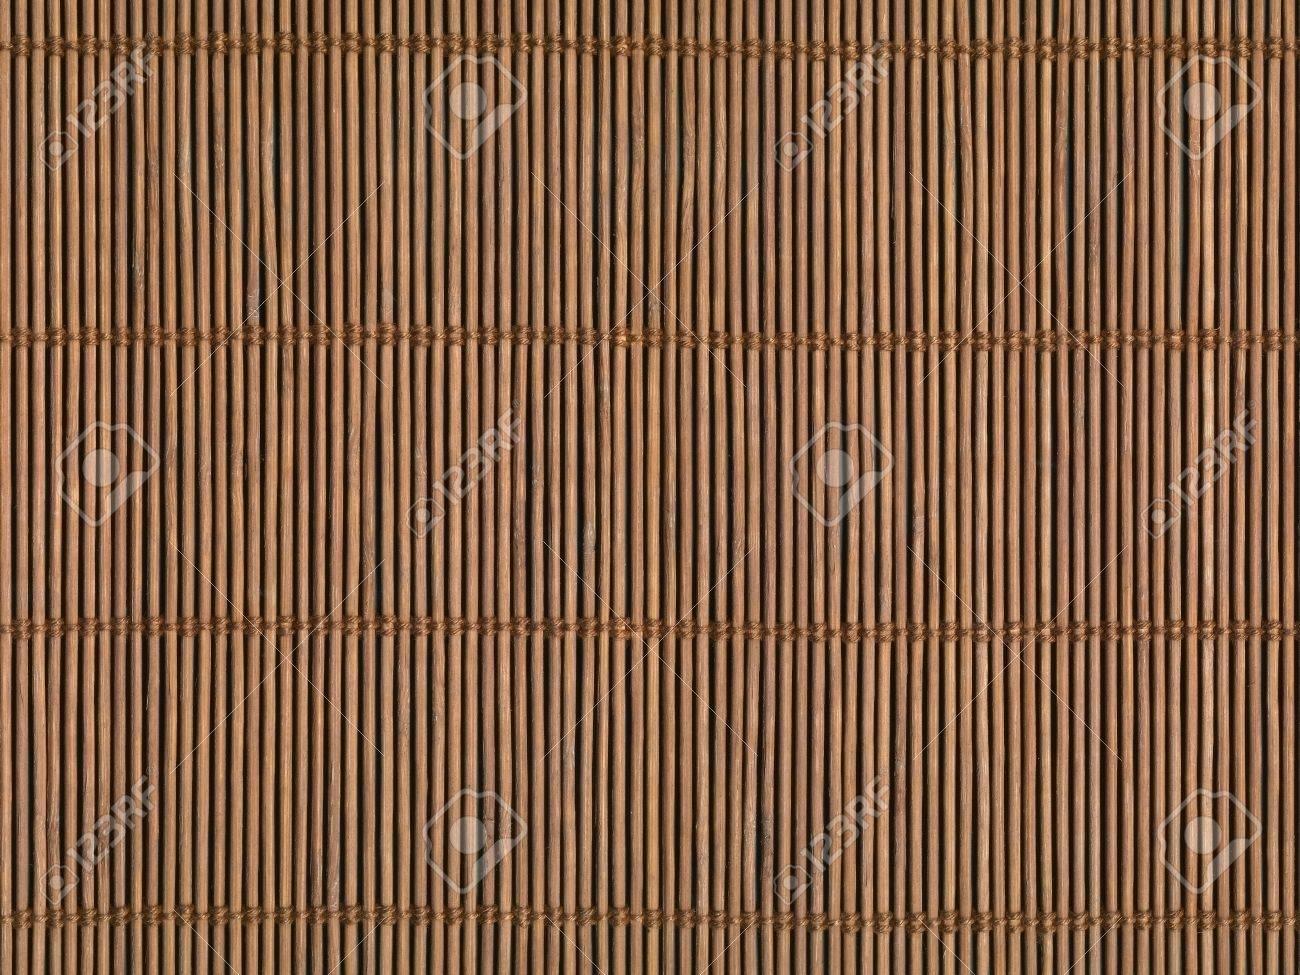 Oriental mat background texture Stock Photo - 2506398